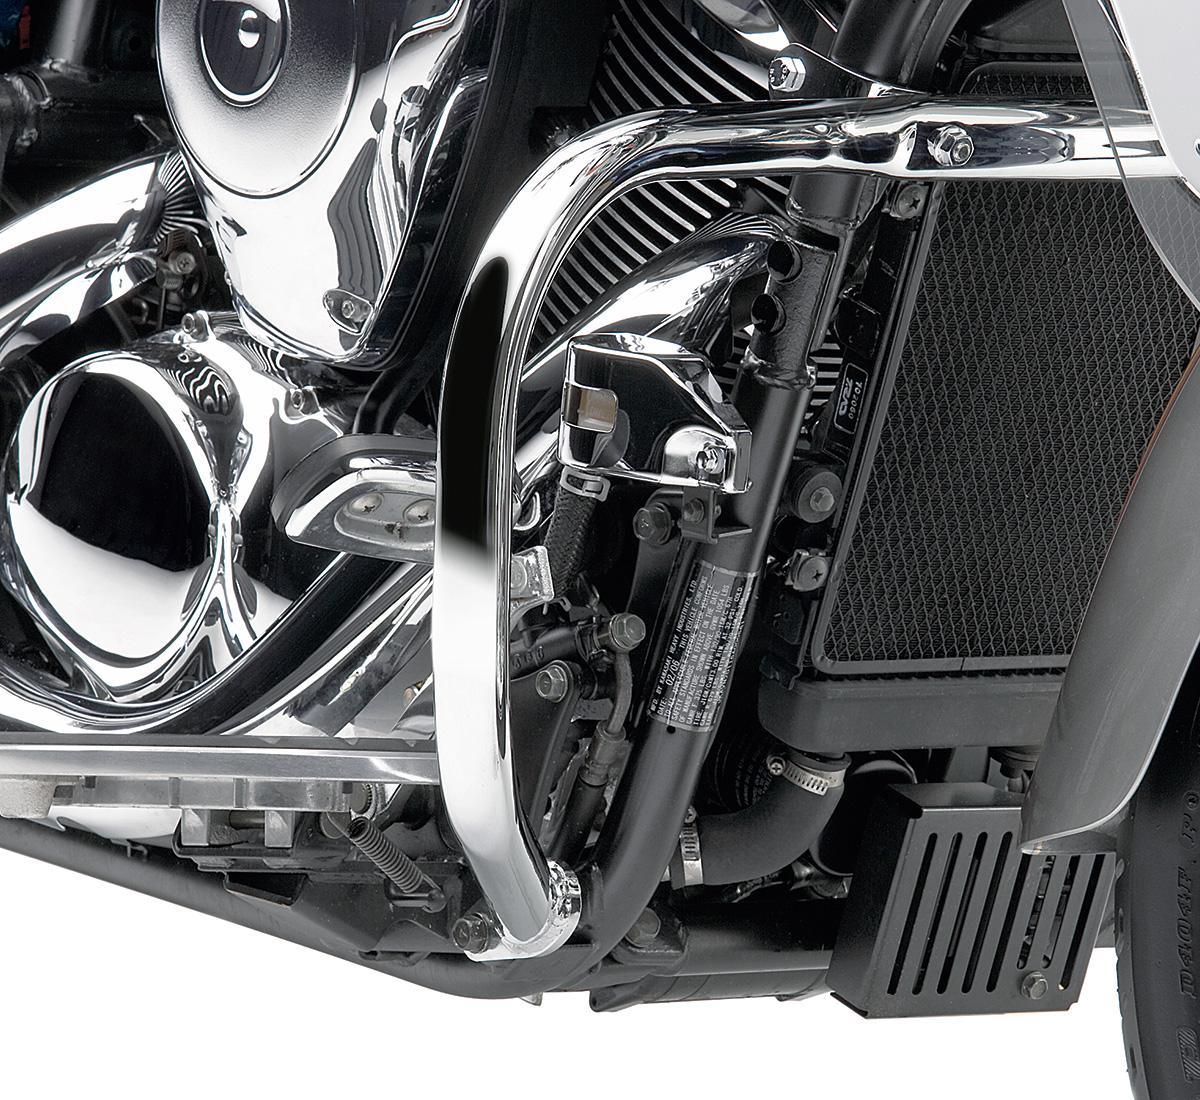 2018 VULCAN® 900 CLASSIC VULCAN® Motorcycle by Kawasaki